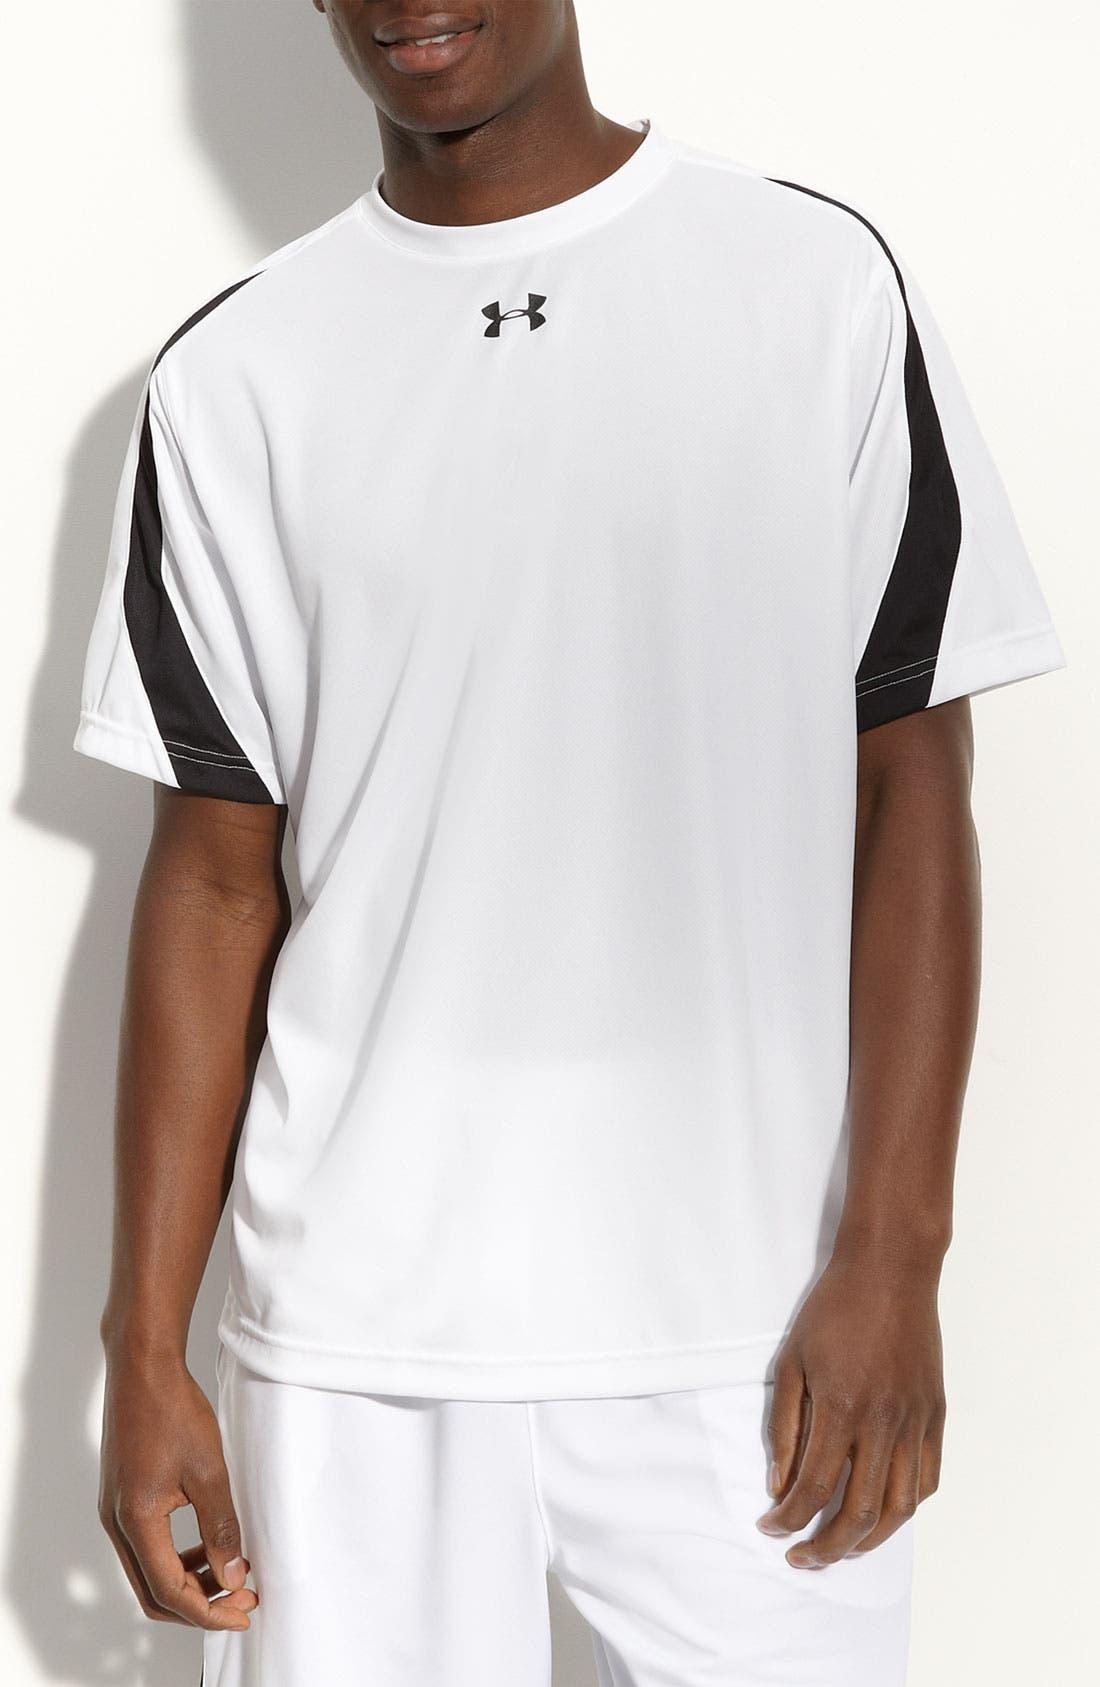 Main Image - Under Armour 'Zone III' HeatGear® T-Shirt